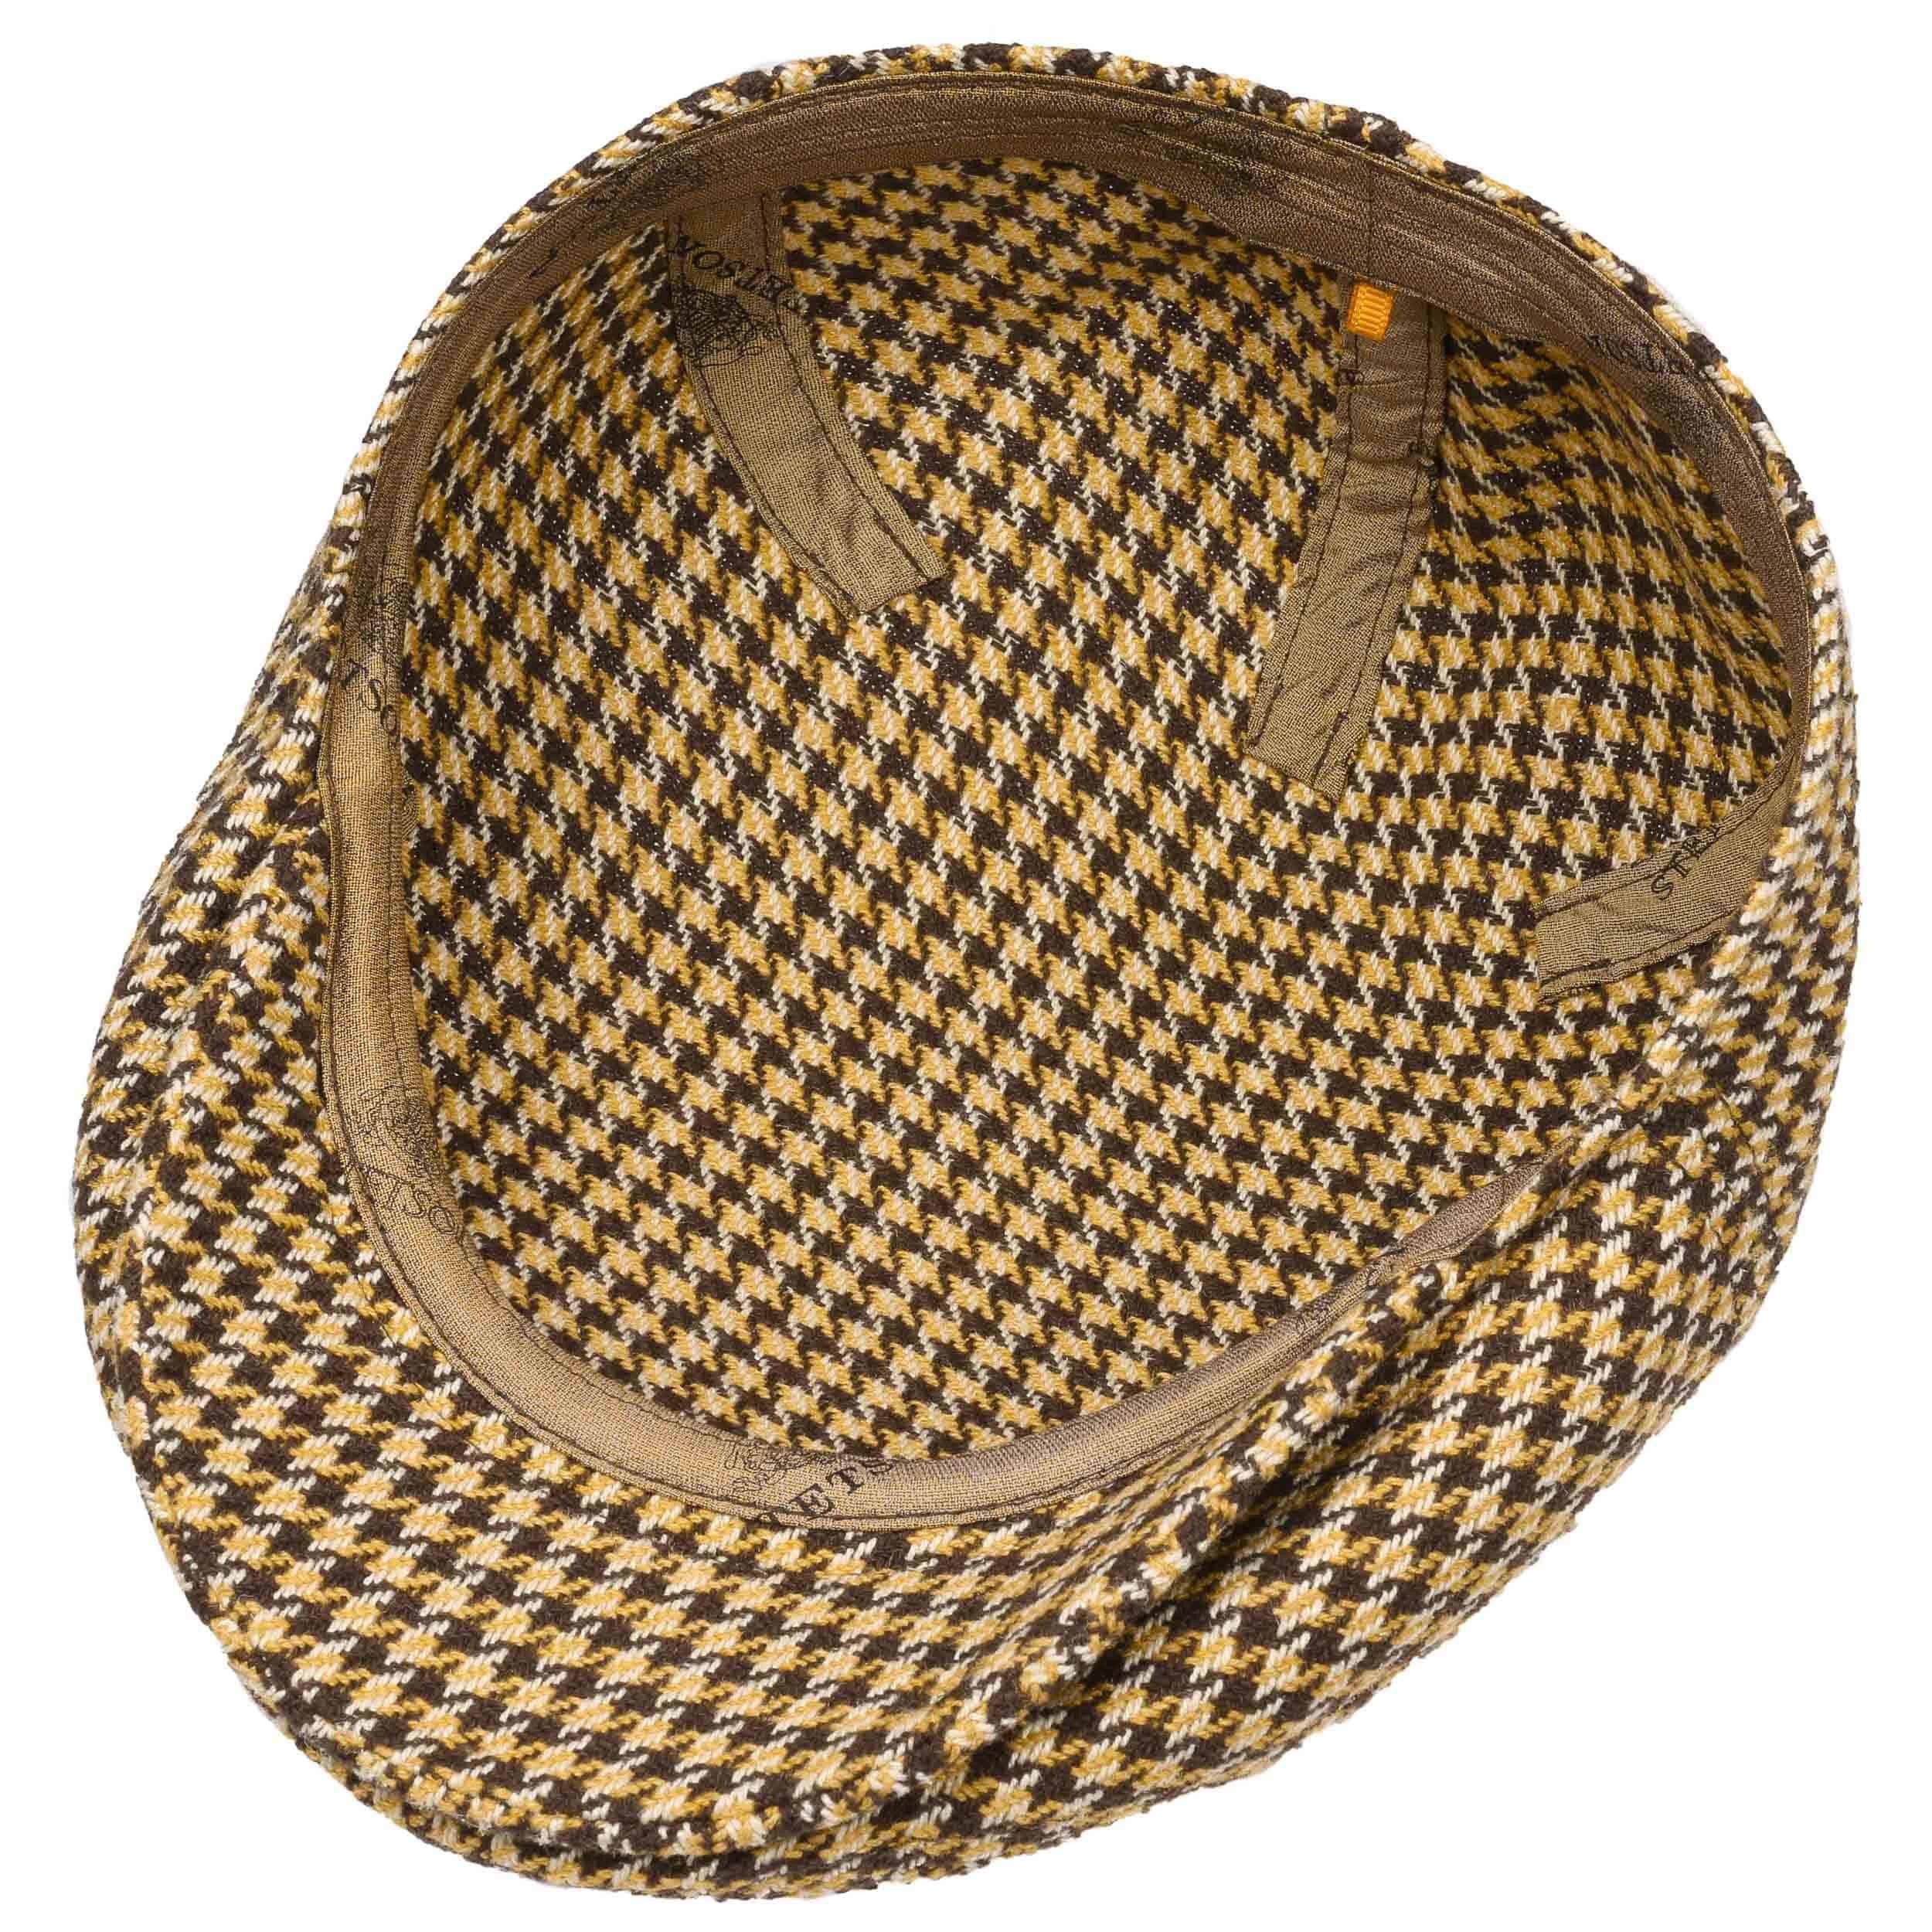 ... Kent Silk Houndstooth Flat Cap by Stetson - beige 2 ... c75a858ae64